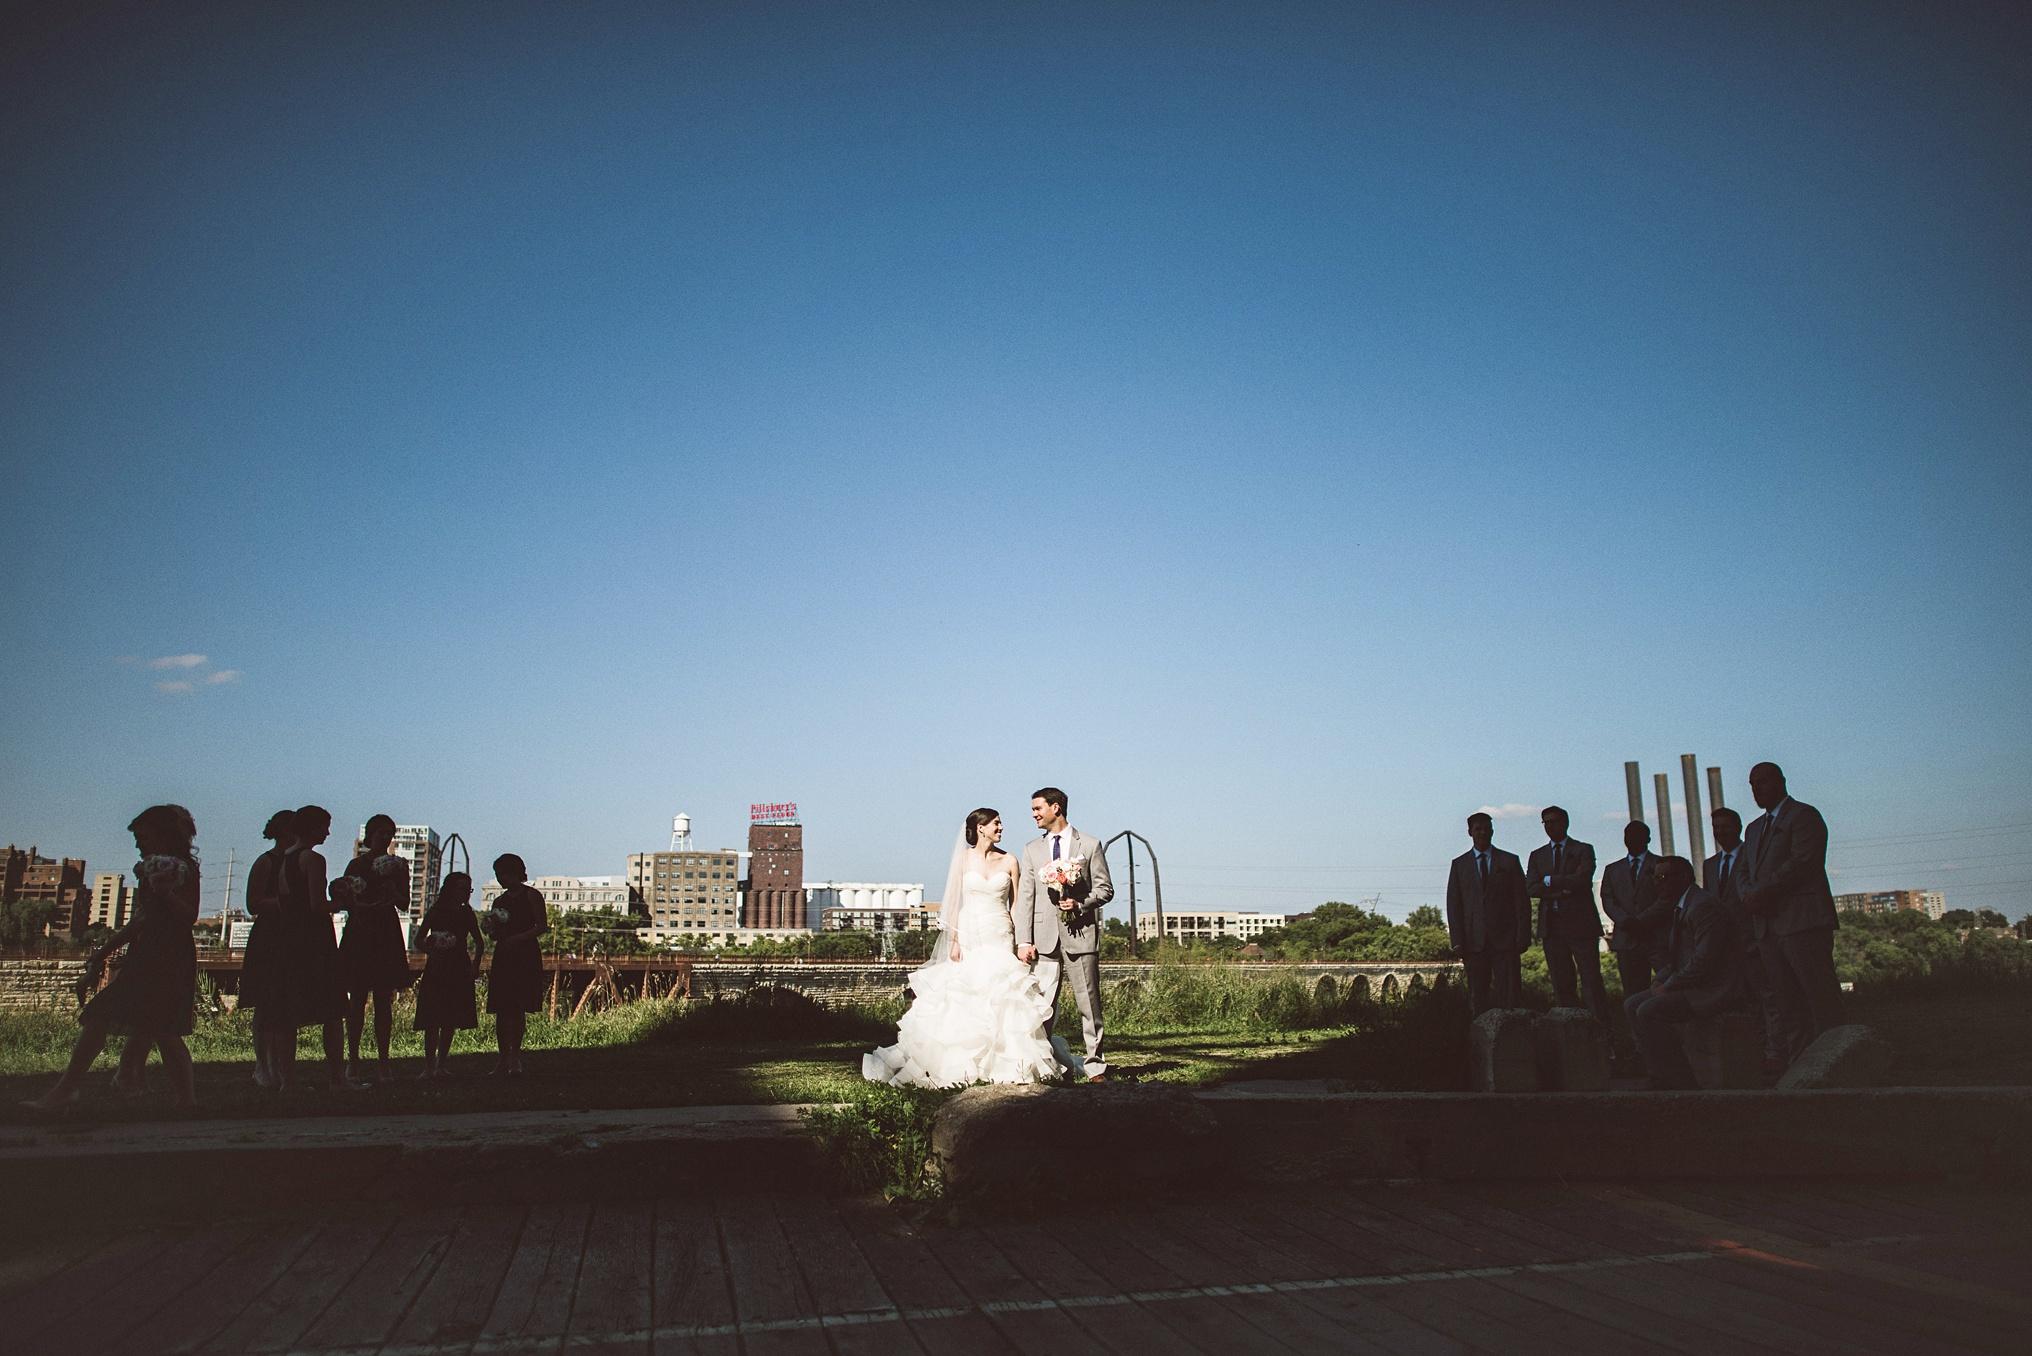 best_wedding_photography_2017_by_lucas_botz_photography_176.jpg